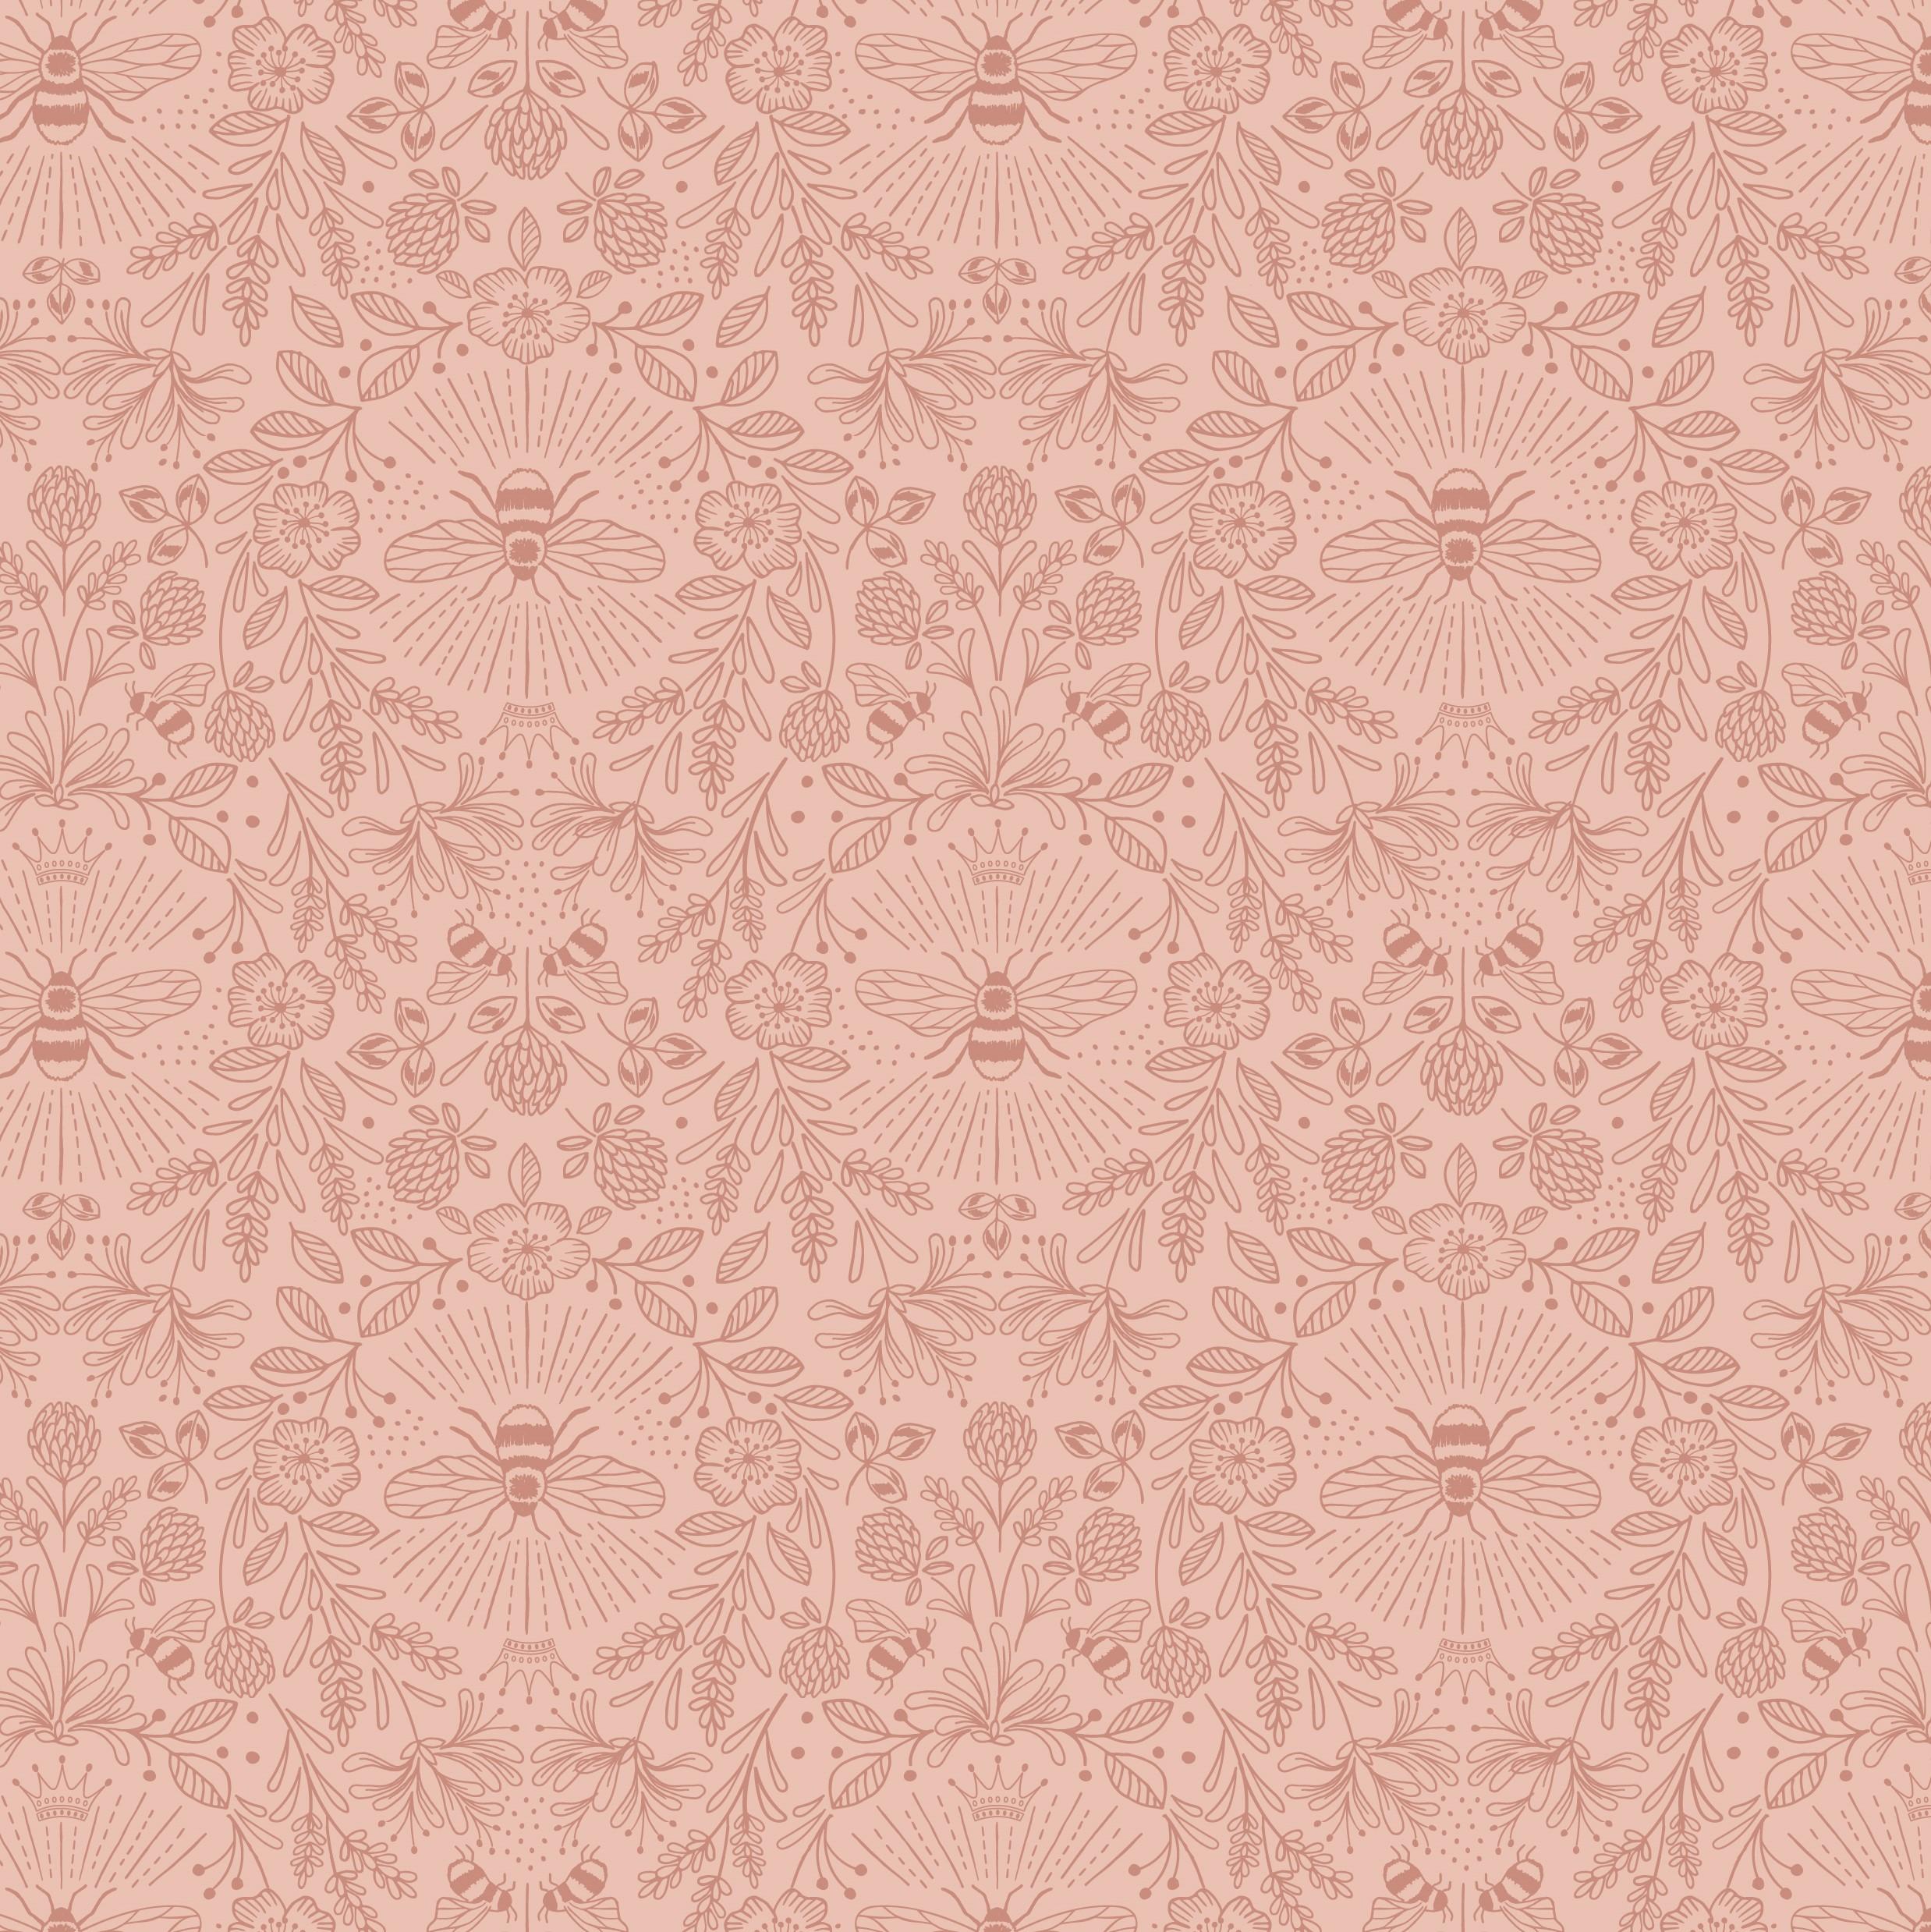 Queen Bee Mono Blush Craft Fabric